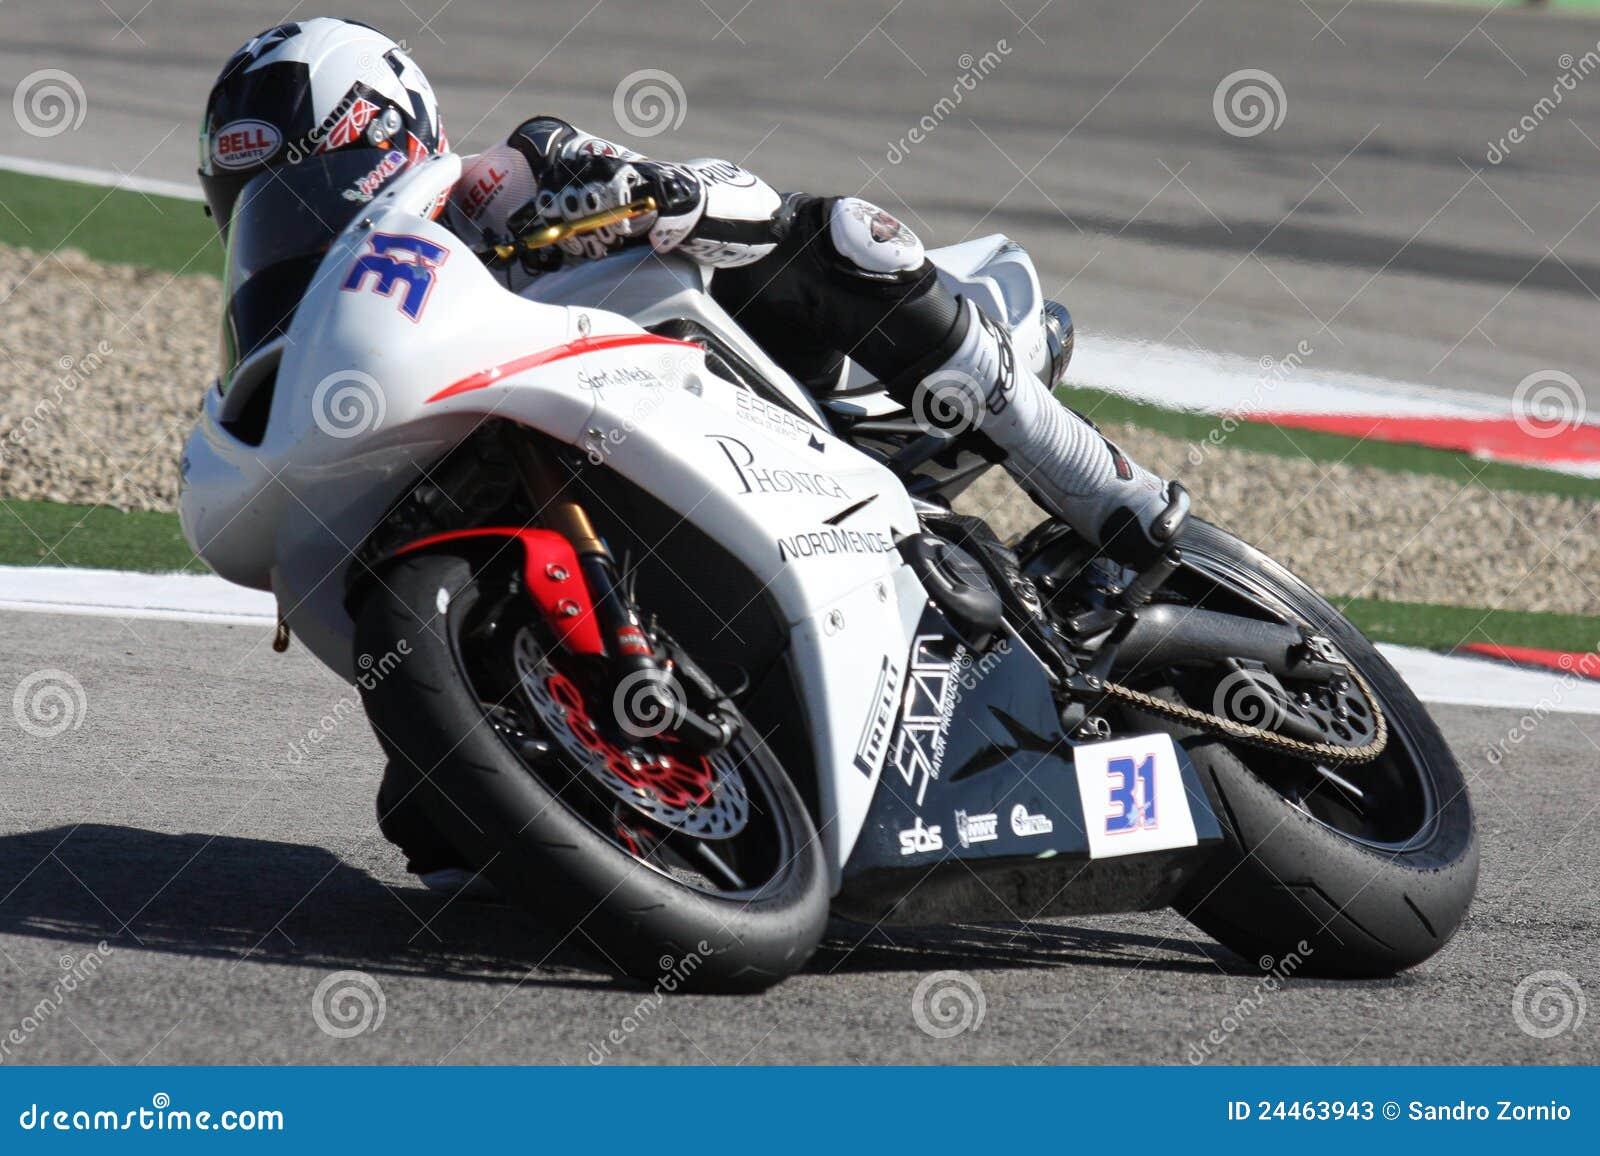 Vittorio Iannuzzo Triumph Daytona 675 Suriano